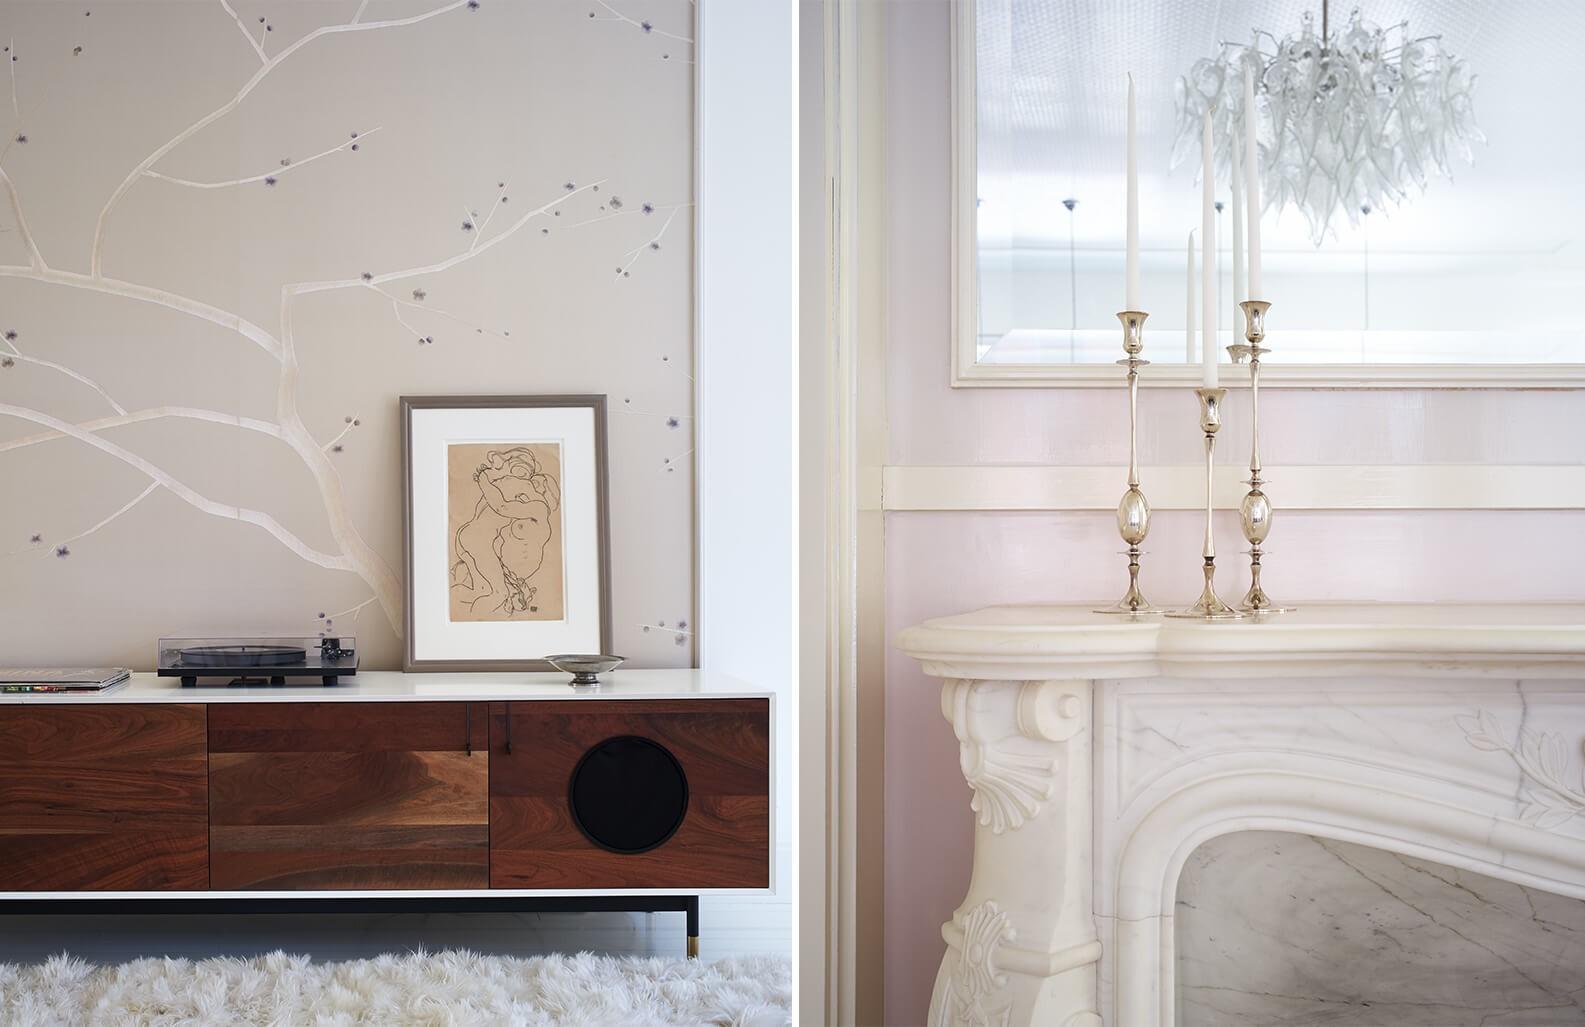 Gwyneth Paltrow's former apartment in New York City